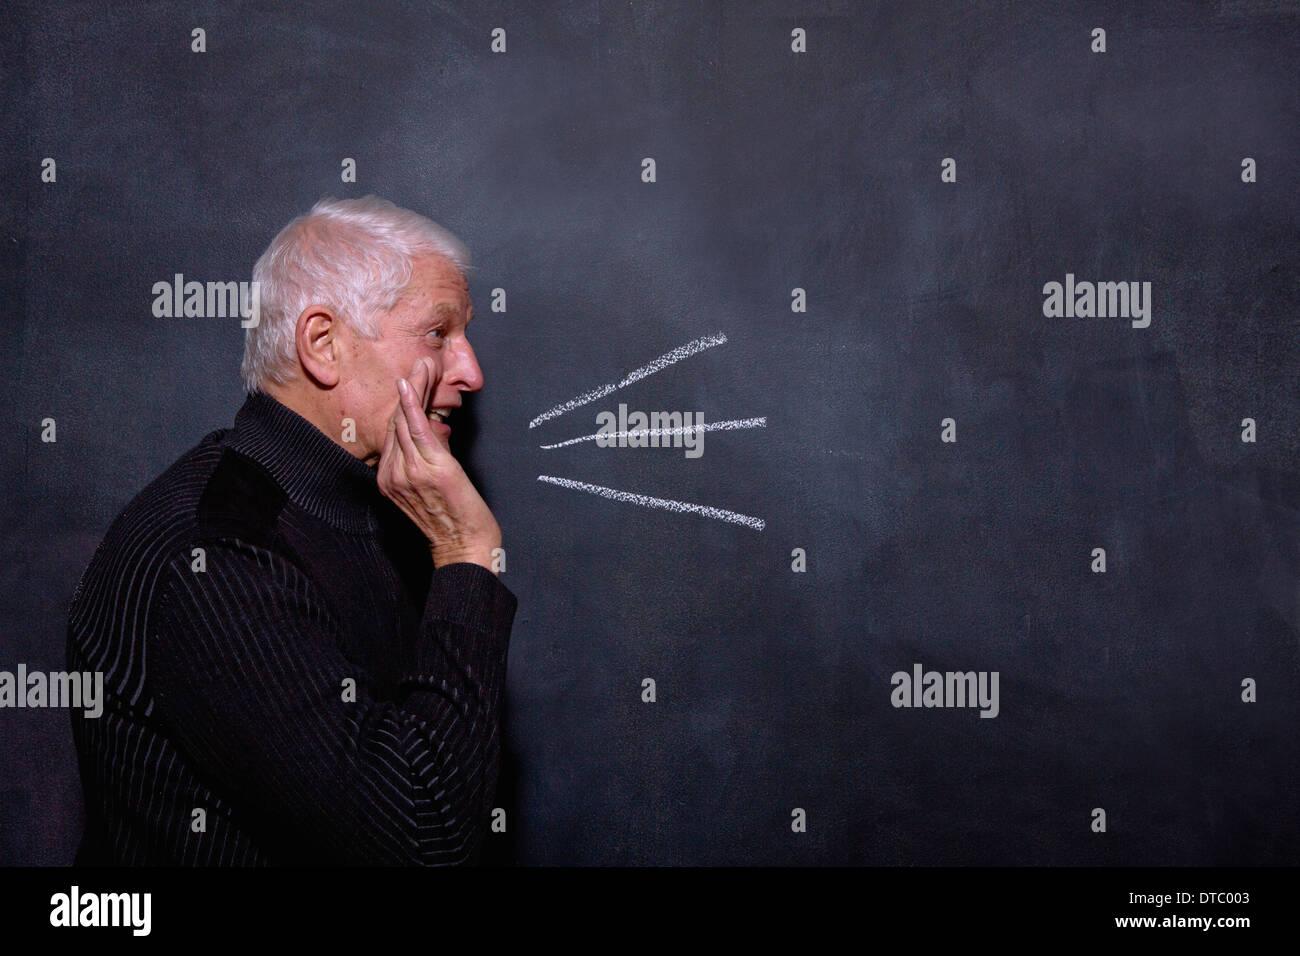 Portrait of senior man in front of blackboard - Stock Image